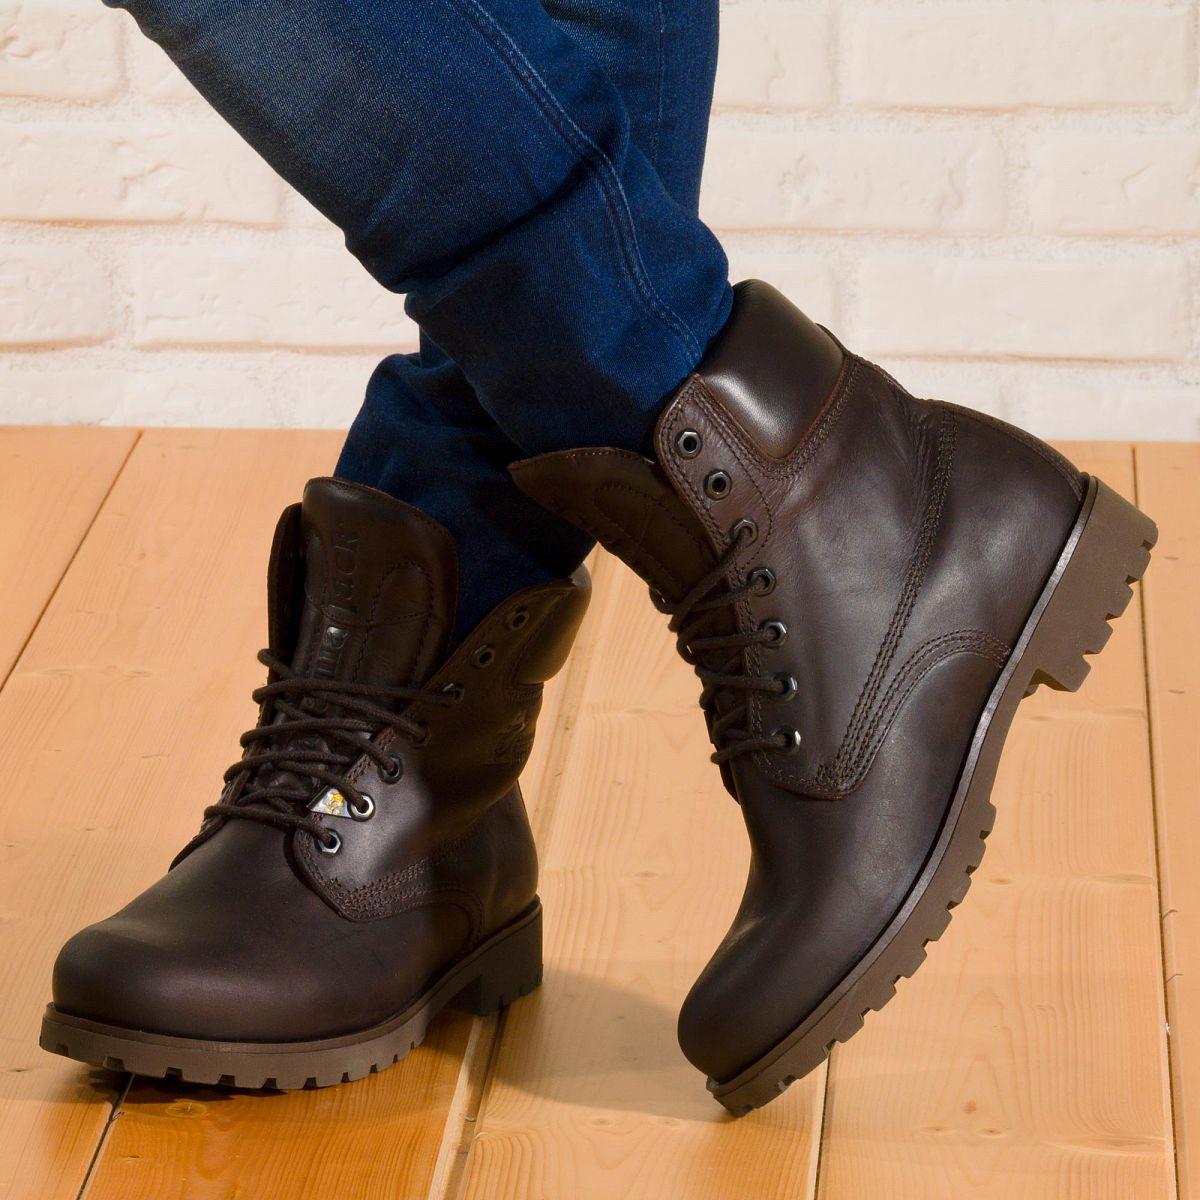 panama 03 limited panama jack men 39 s boots buy online. Black Bedroom Furniture Sets. Home Design Ideas